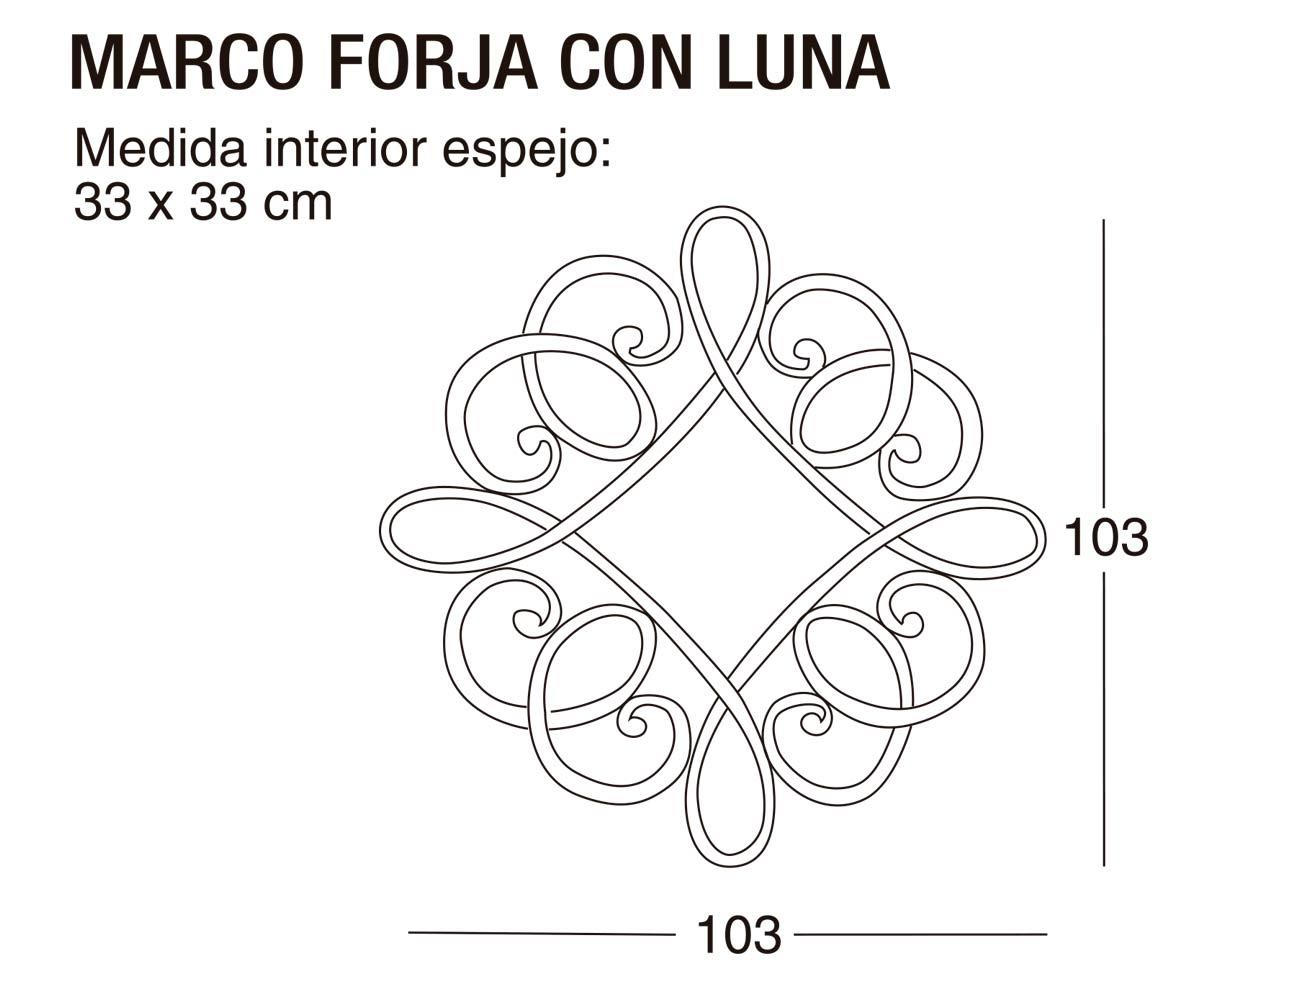 Marco forja luna 103x103